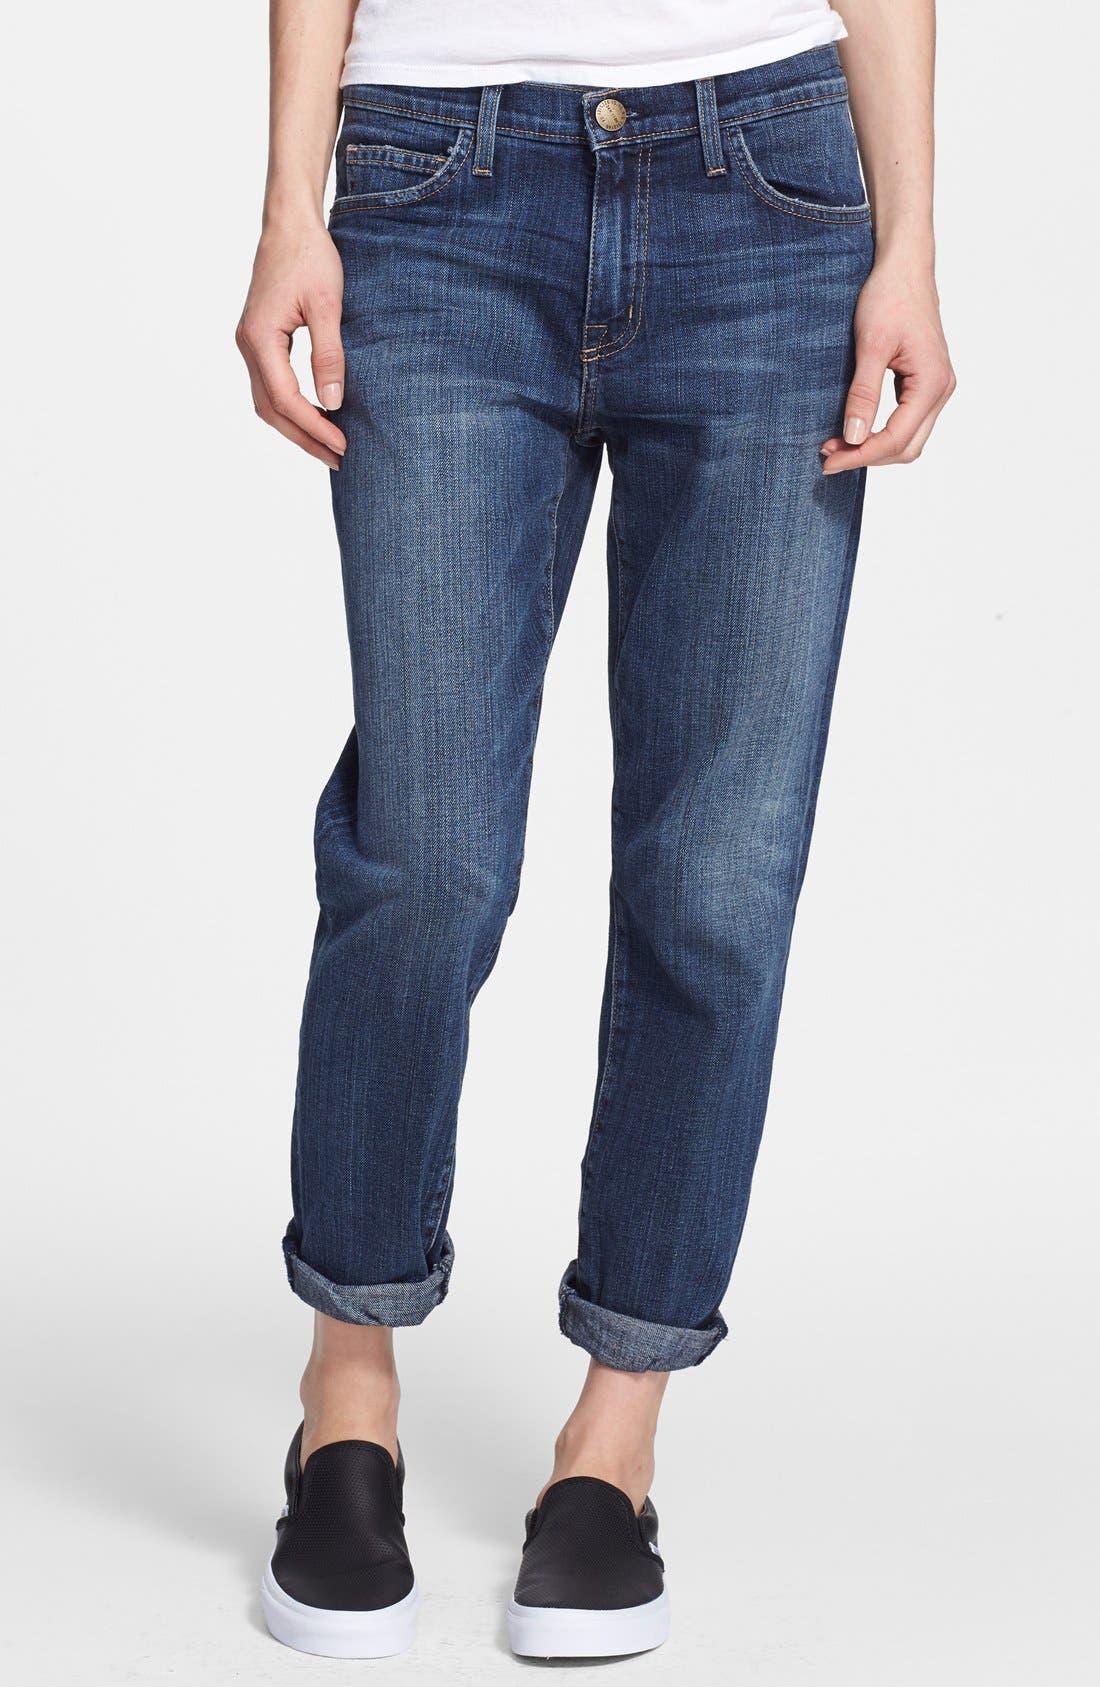 Current/Elliott 'The Fling' Boyfriend Jeans ...